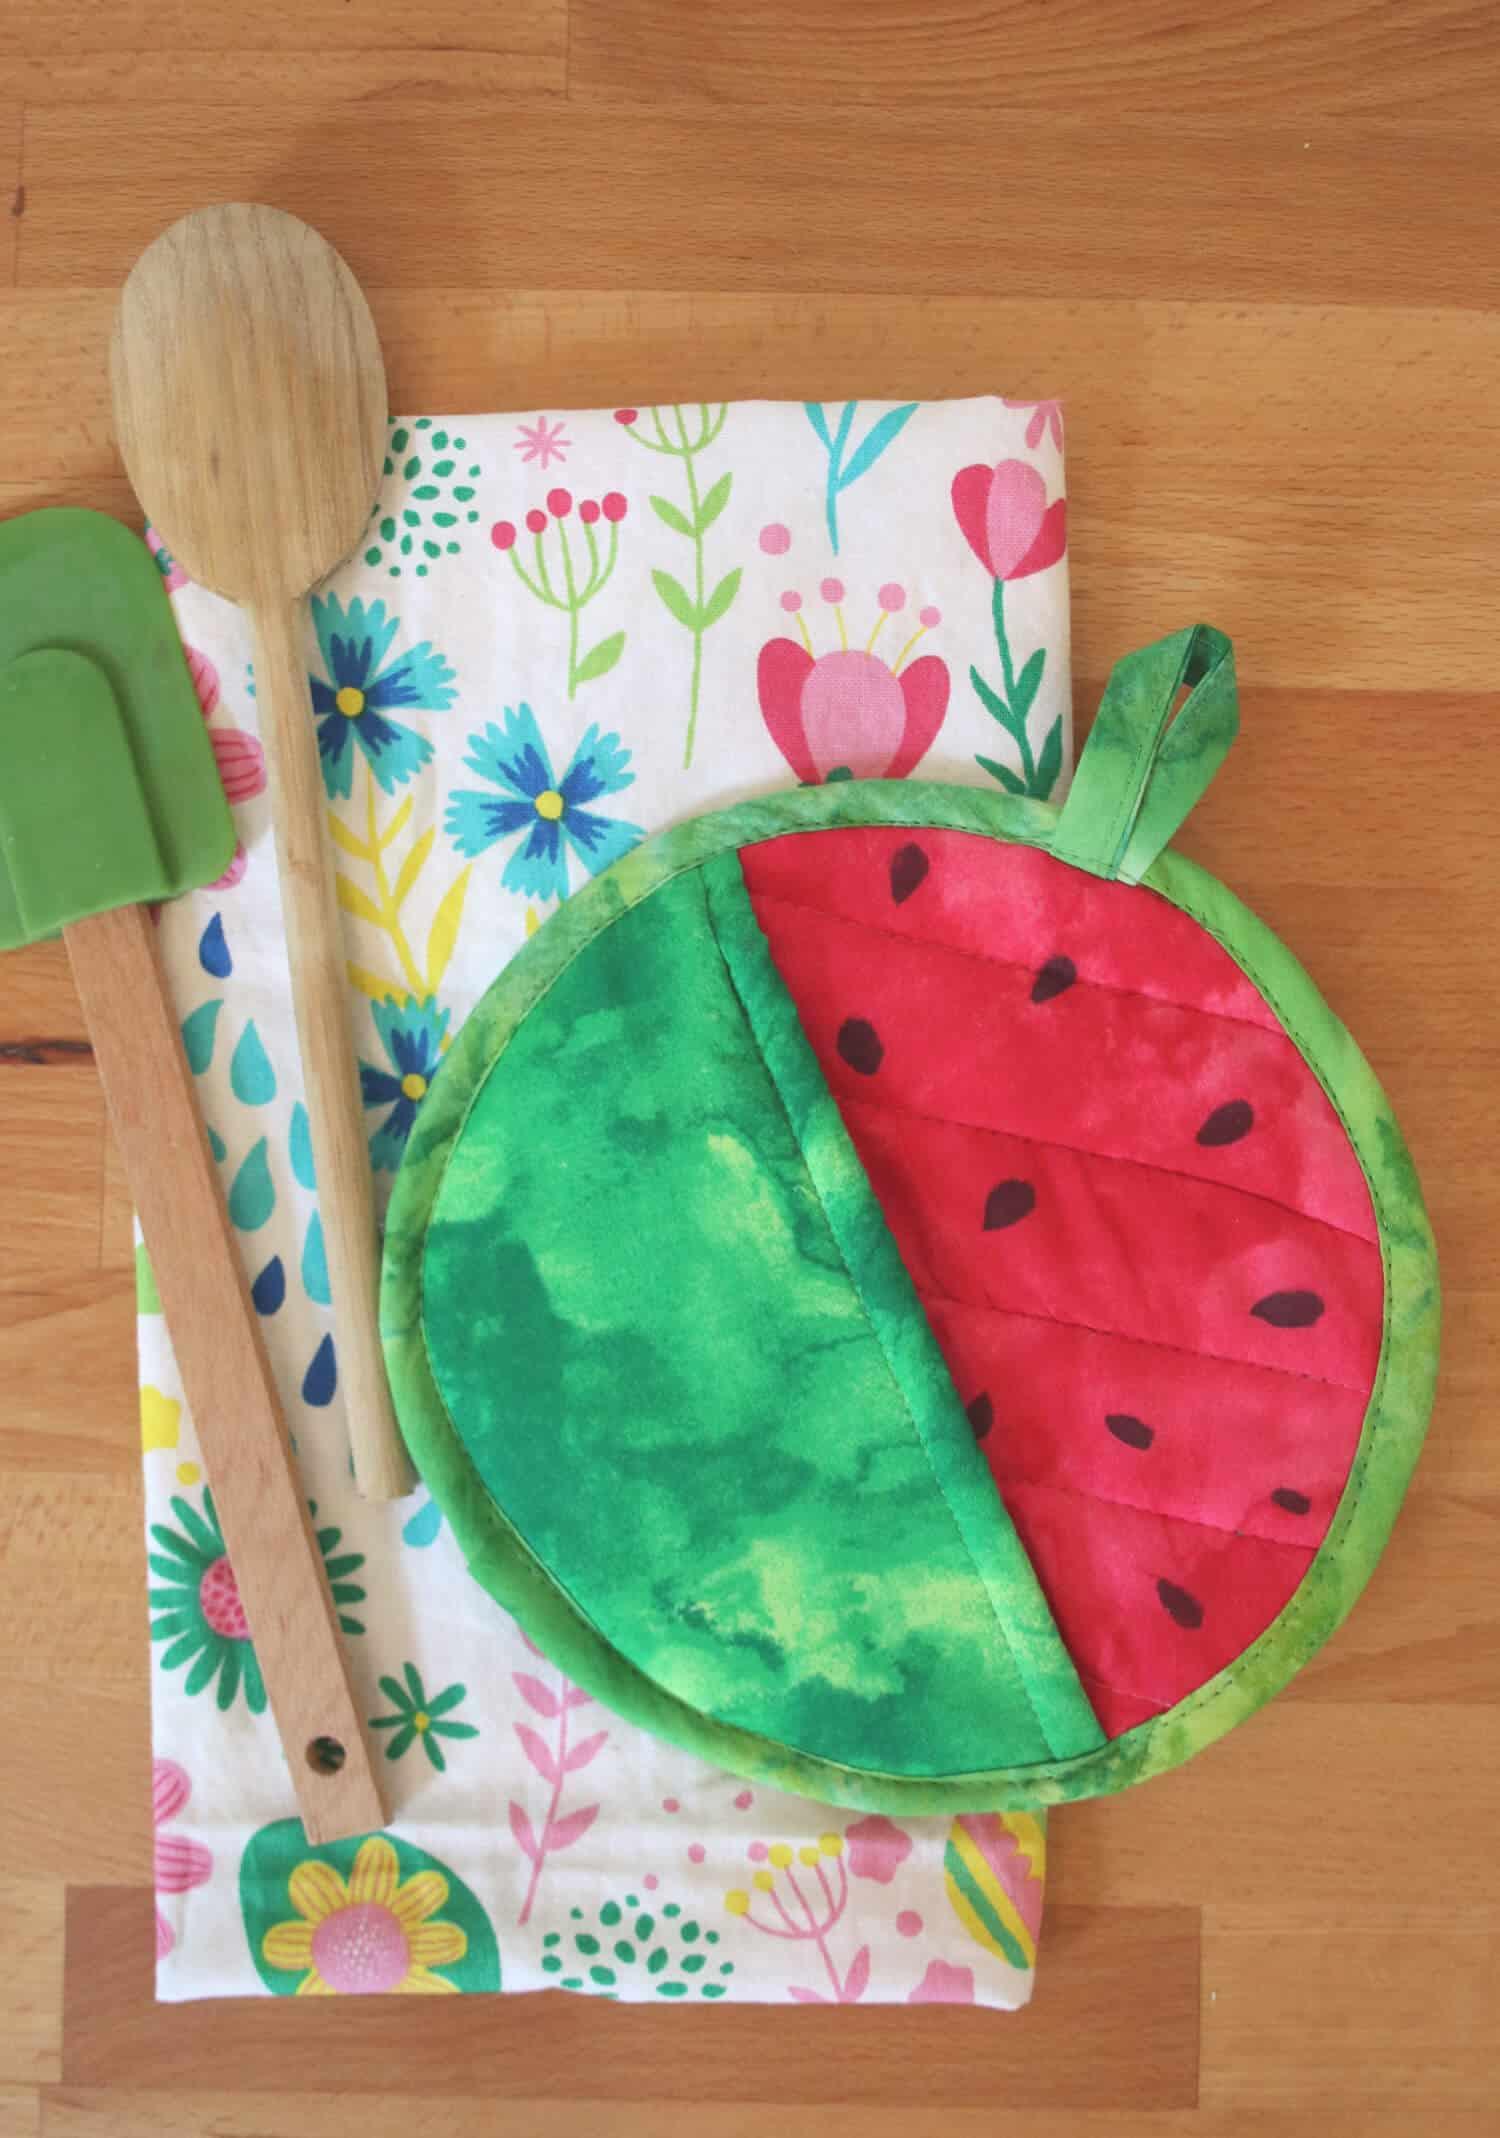 DIY watermelon potholder of bright fabric